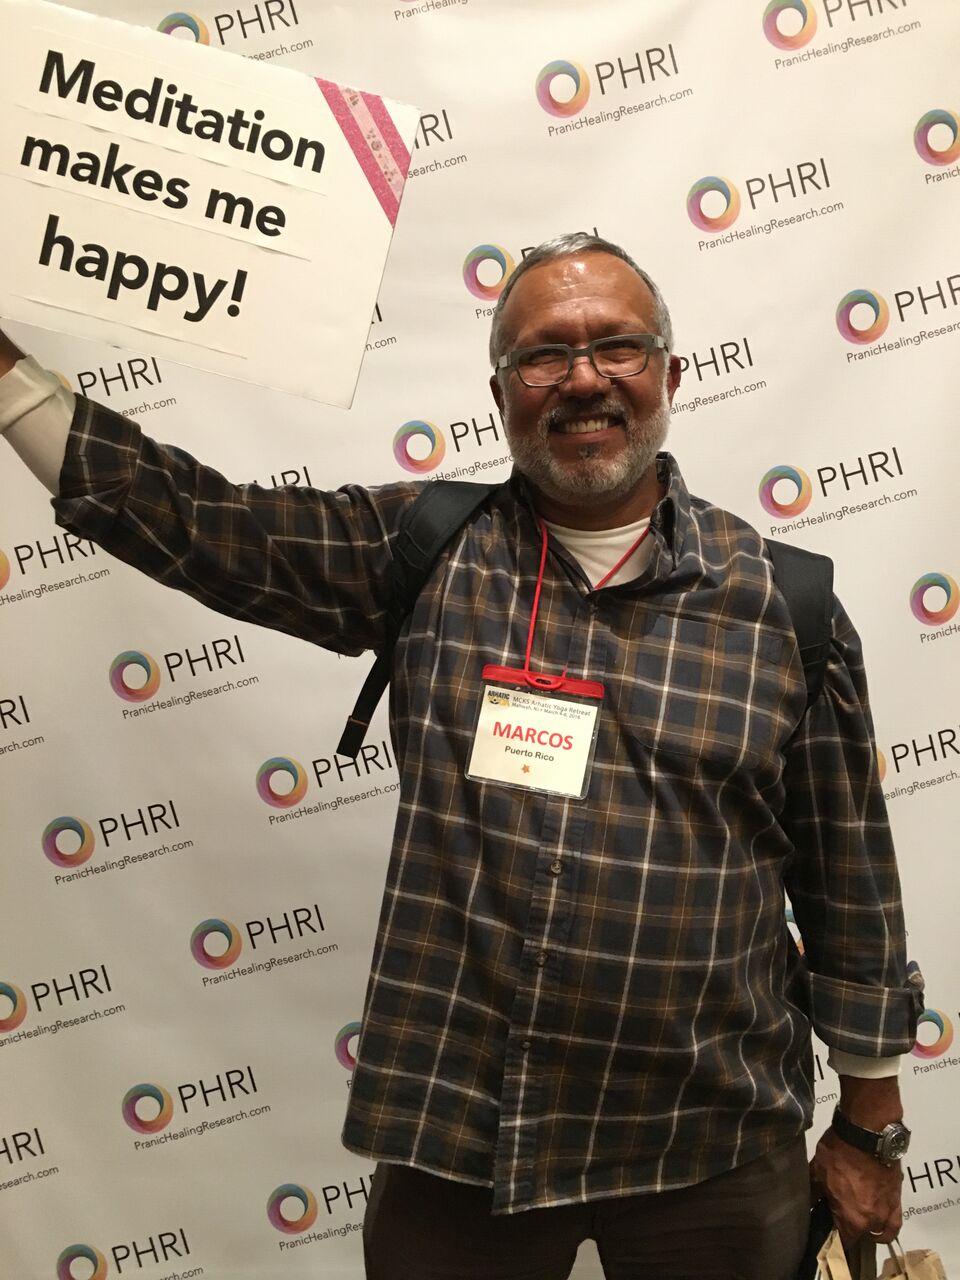 Pic_PHRI_MTH Happy.jpg